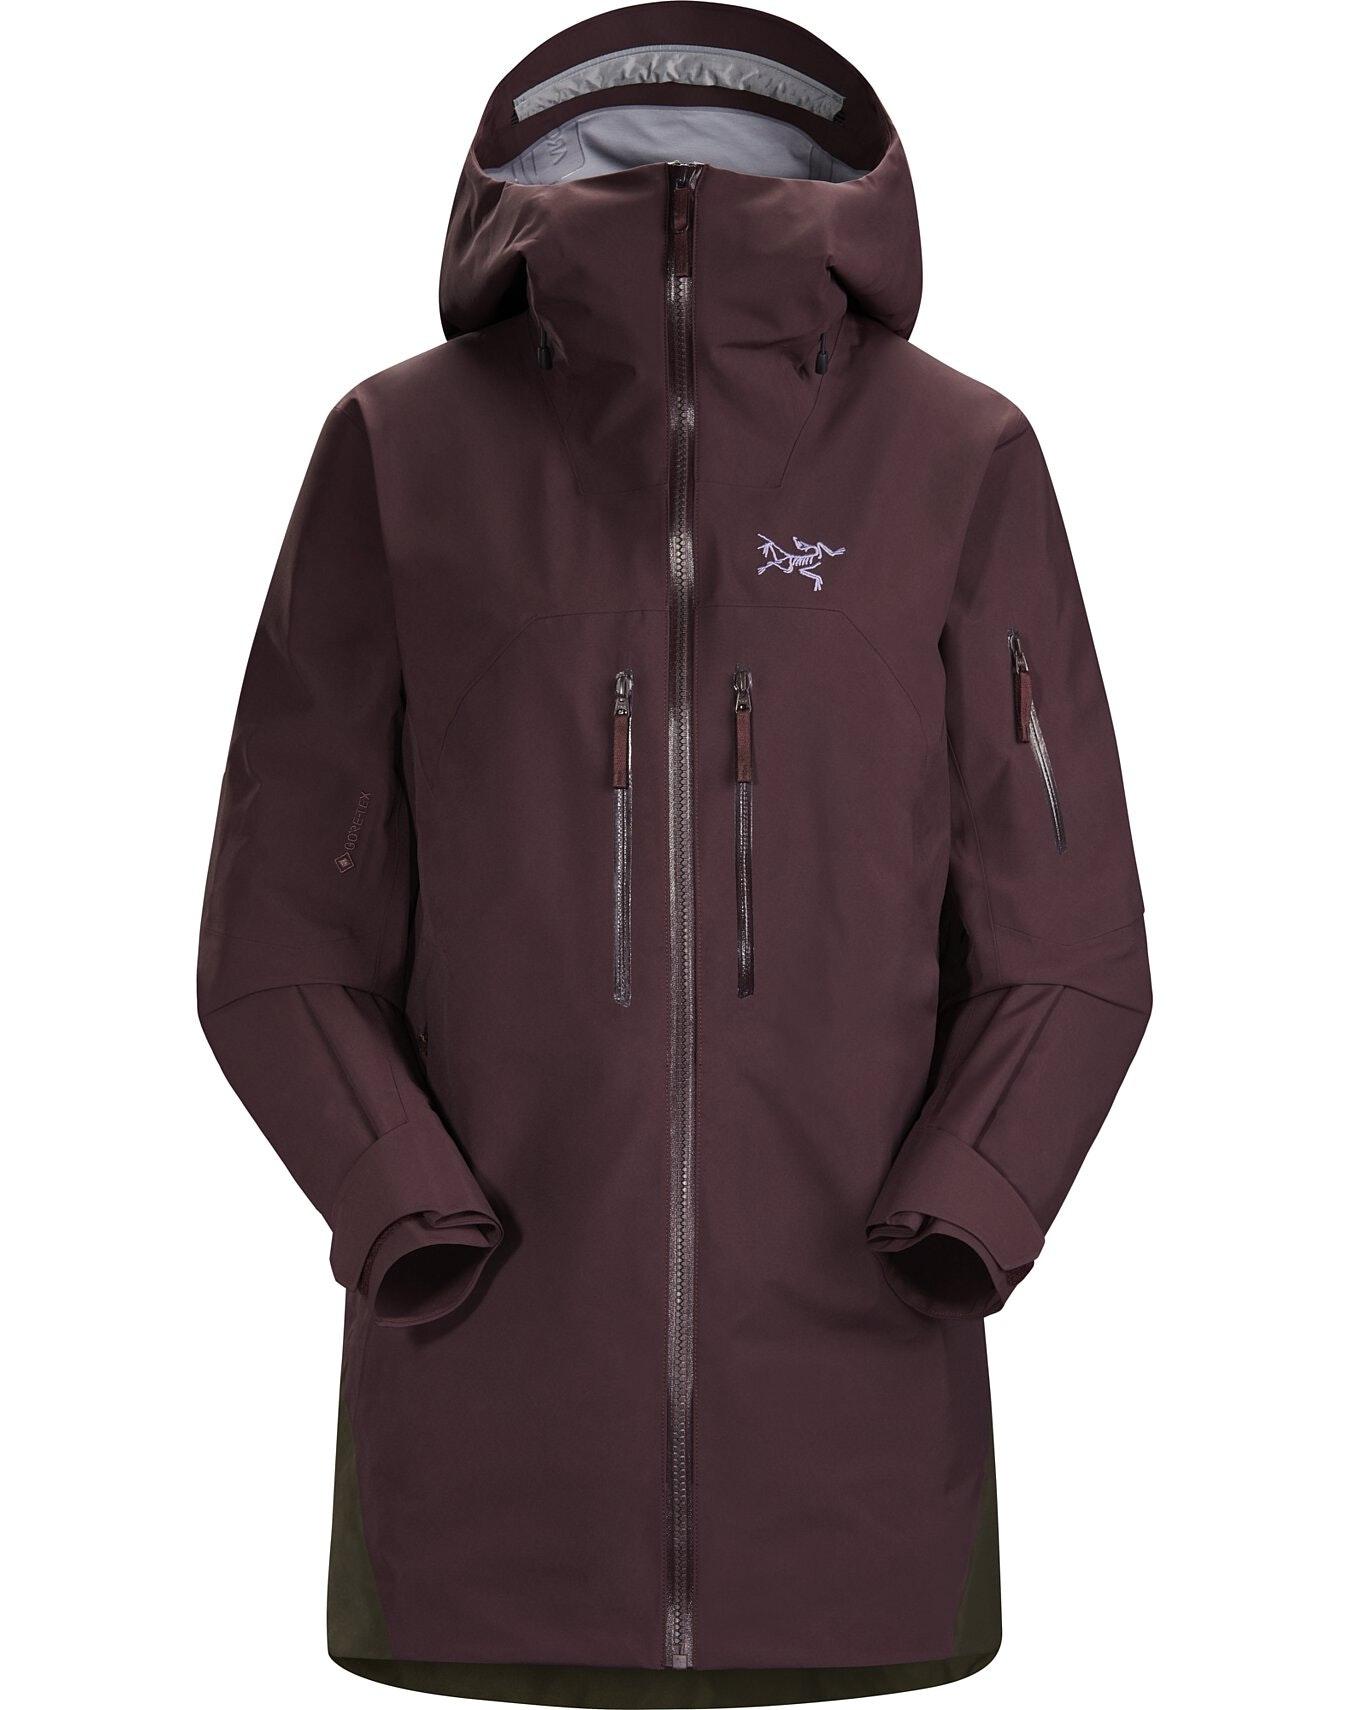 Sentinel LT Jacket Midnight Flume